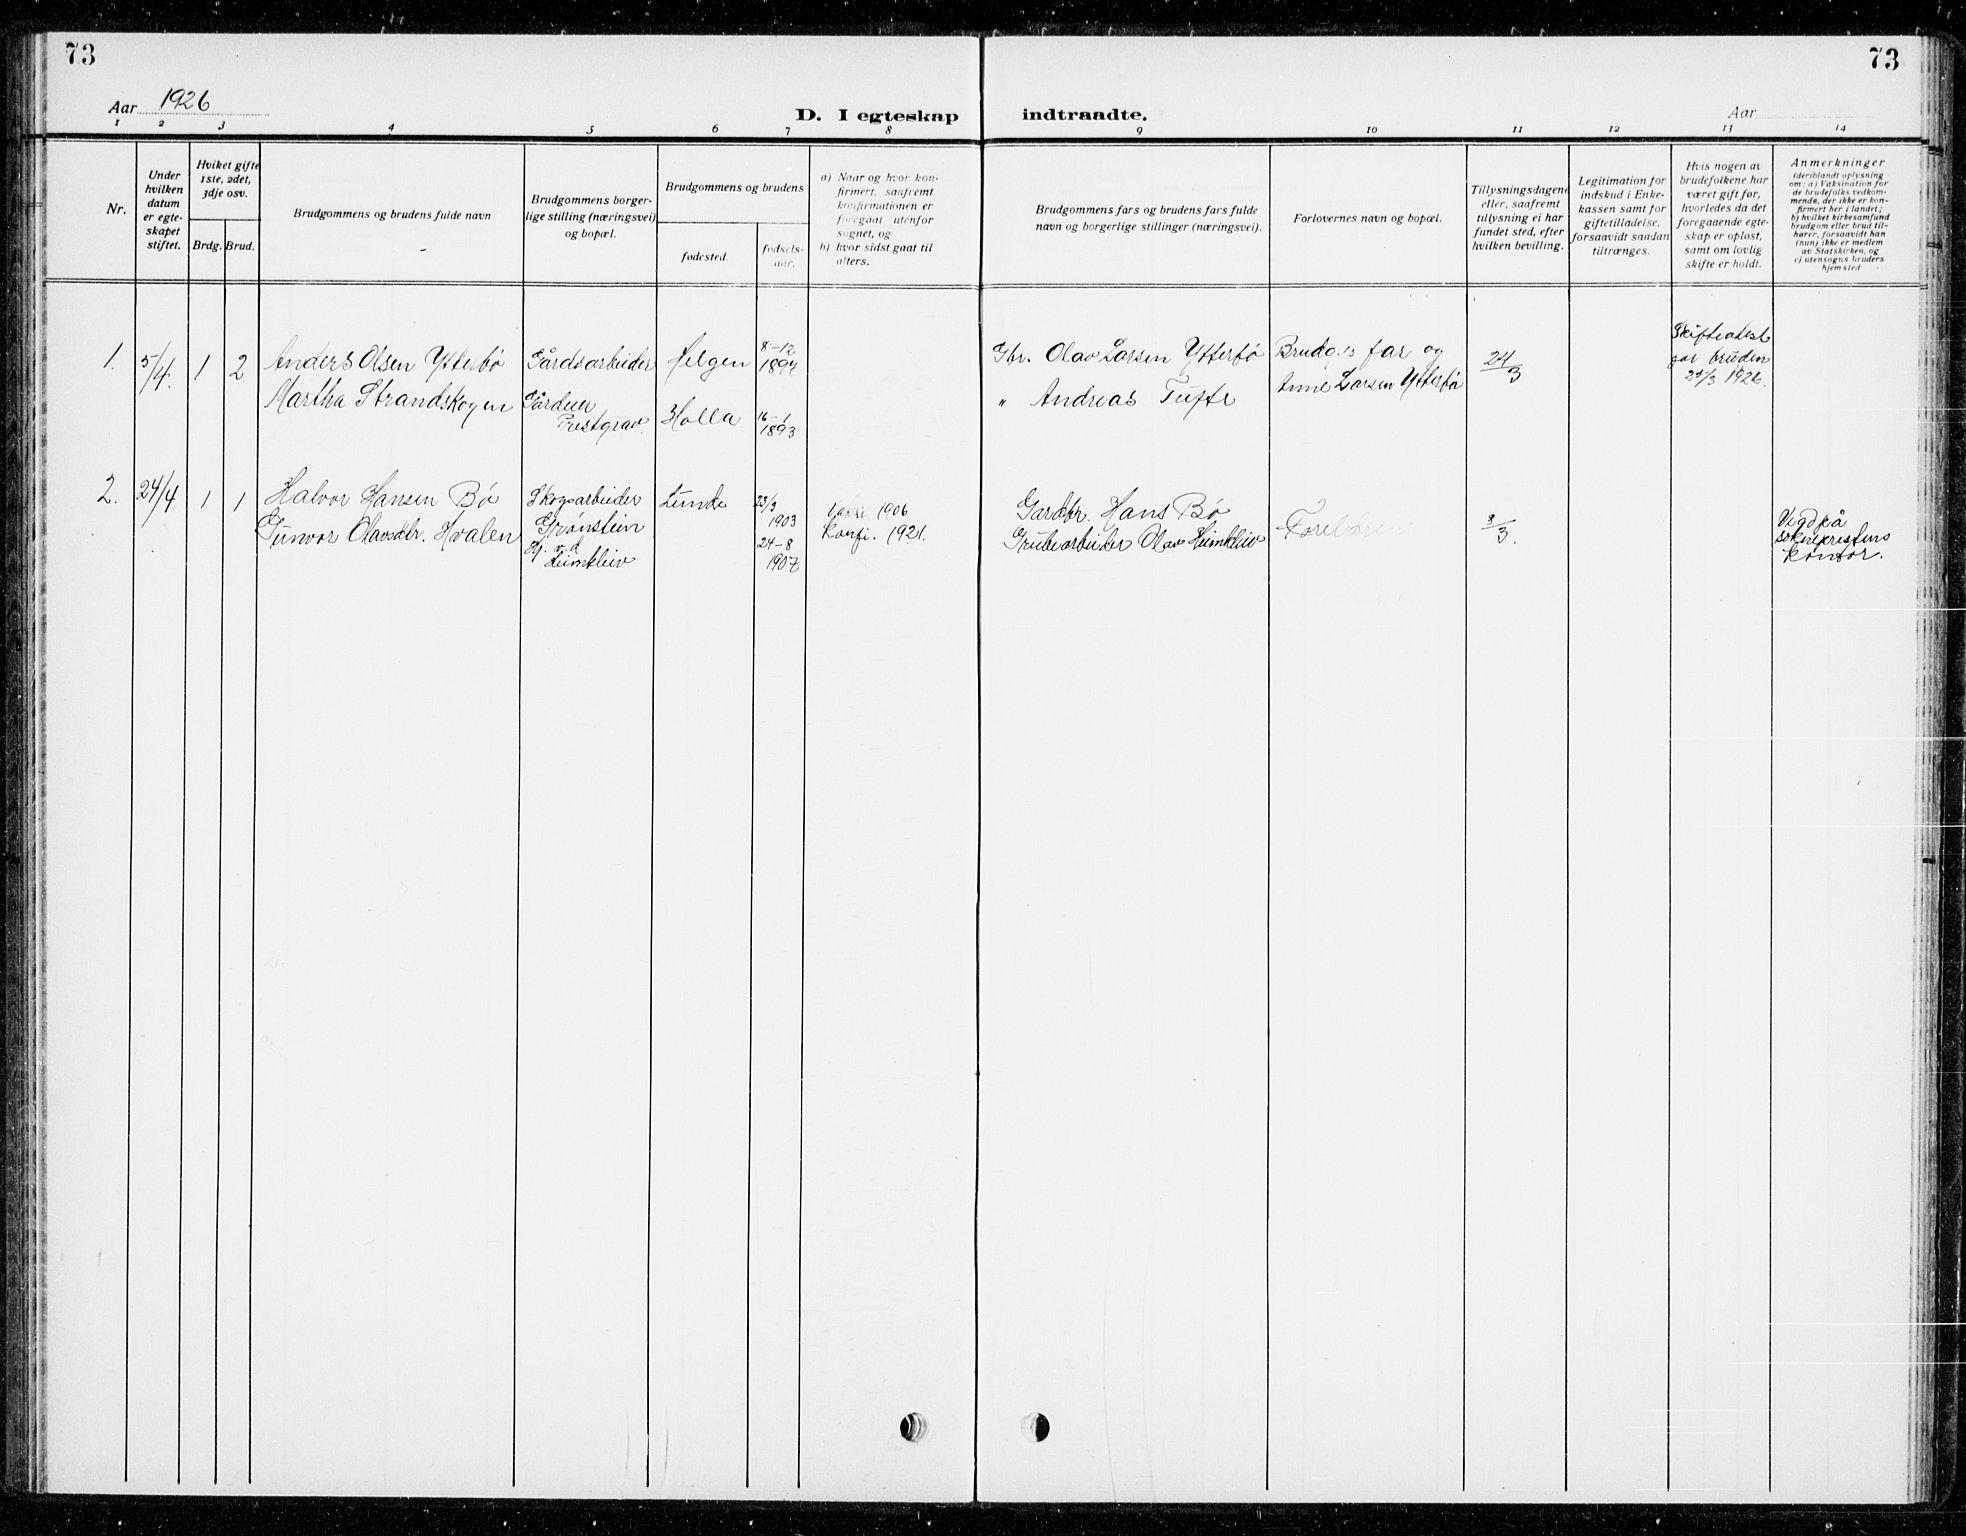 SAKO, Holla kirkebøker, G/Gb/L0003: Klokkerbok nr. II 3, 1914-1941, s. 73